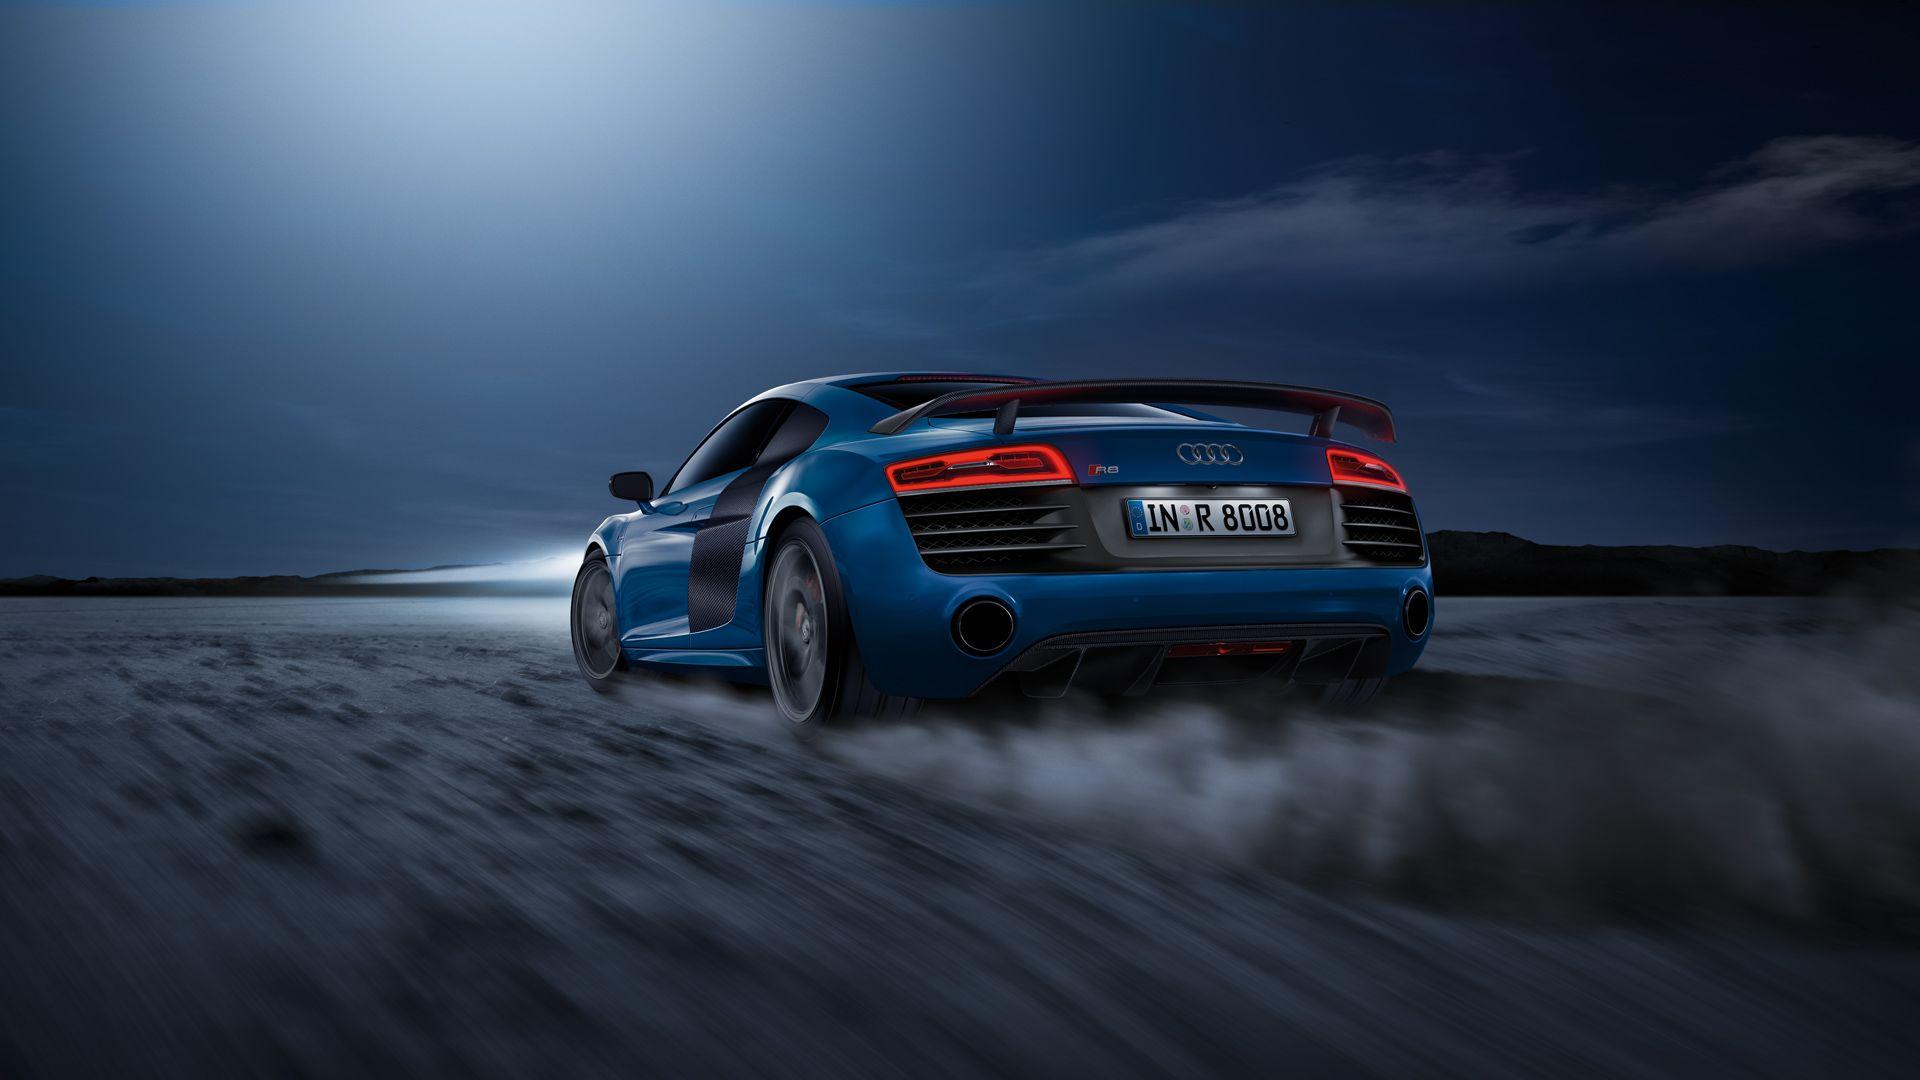 Audi R Buscar Con Google Led Car Lights Pinterest - Audi car video download